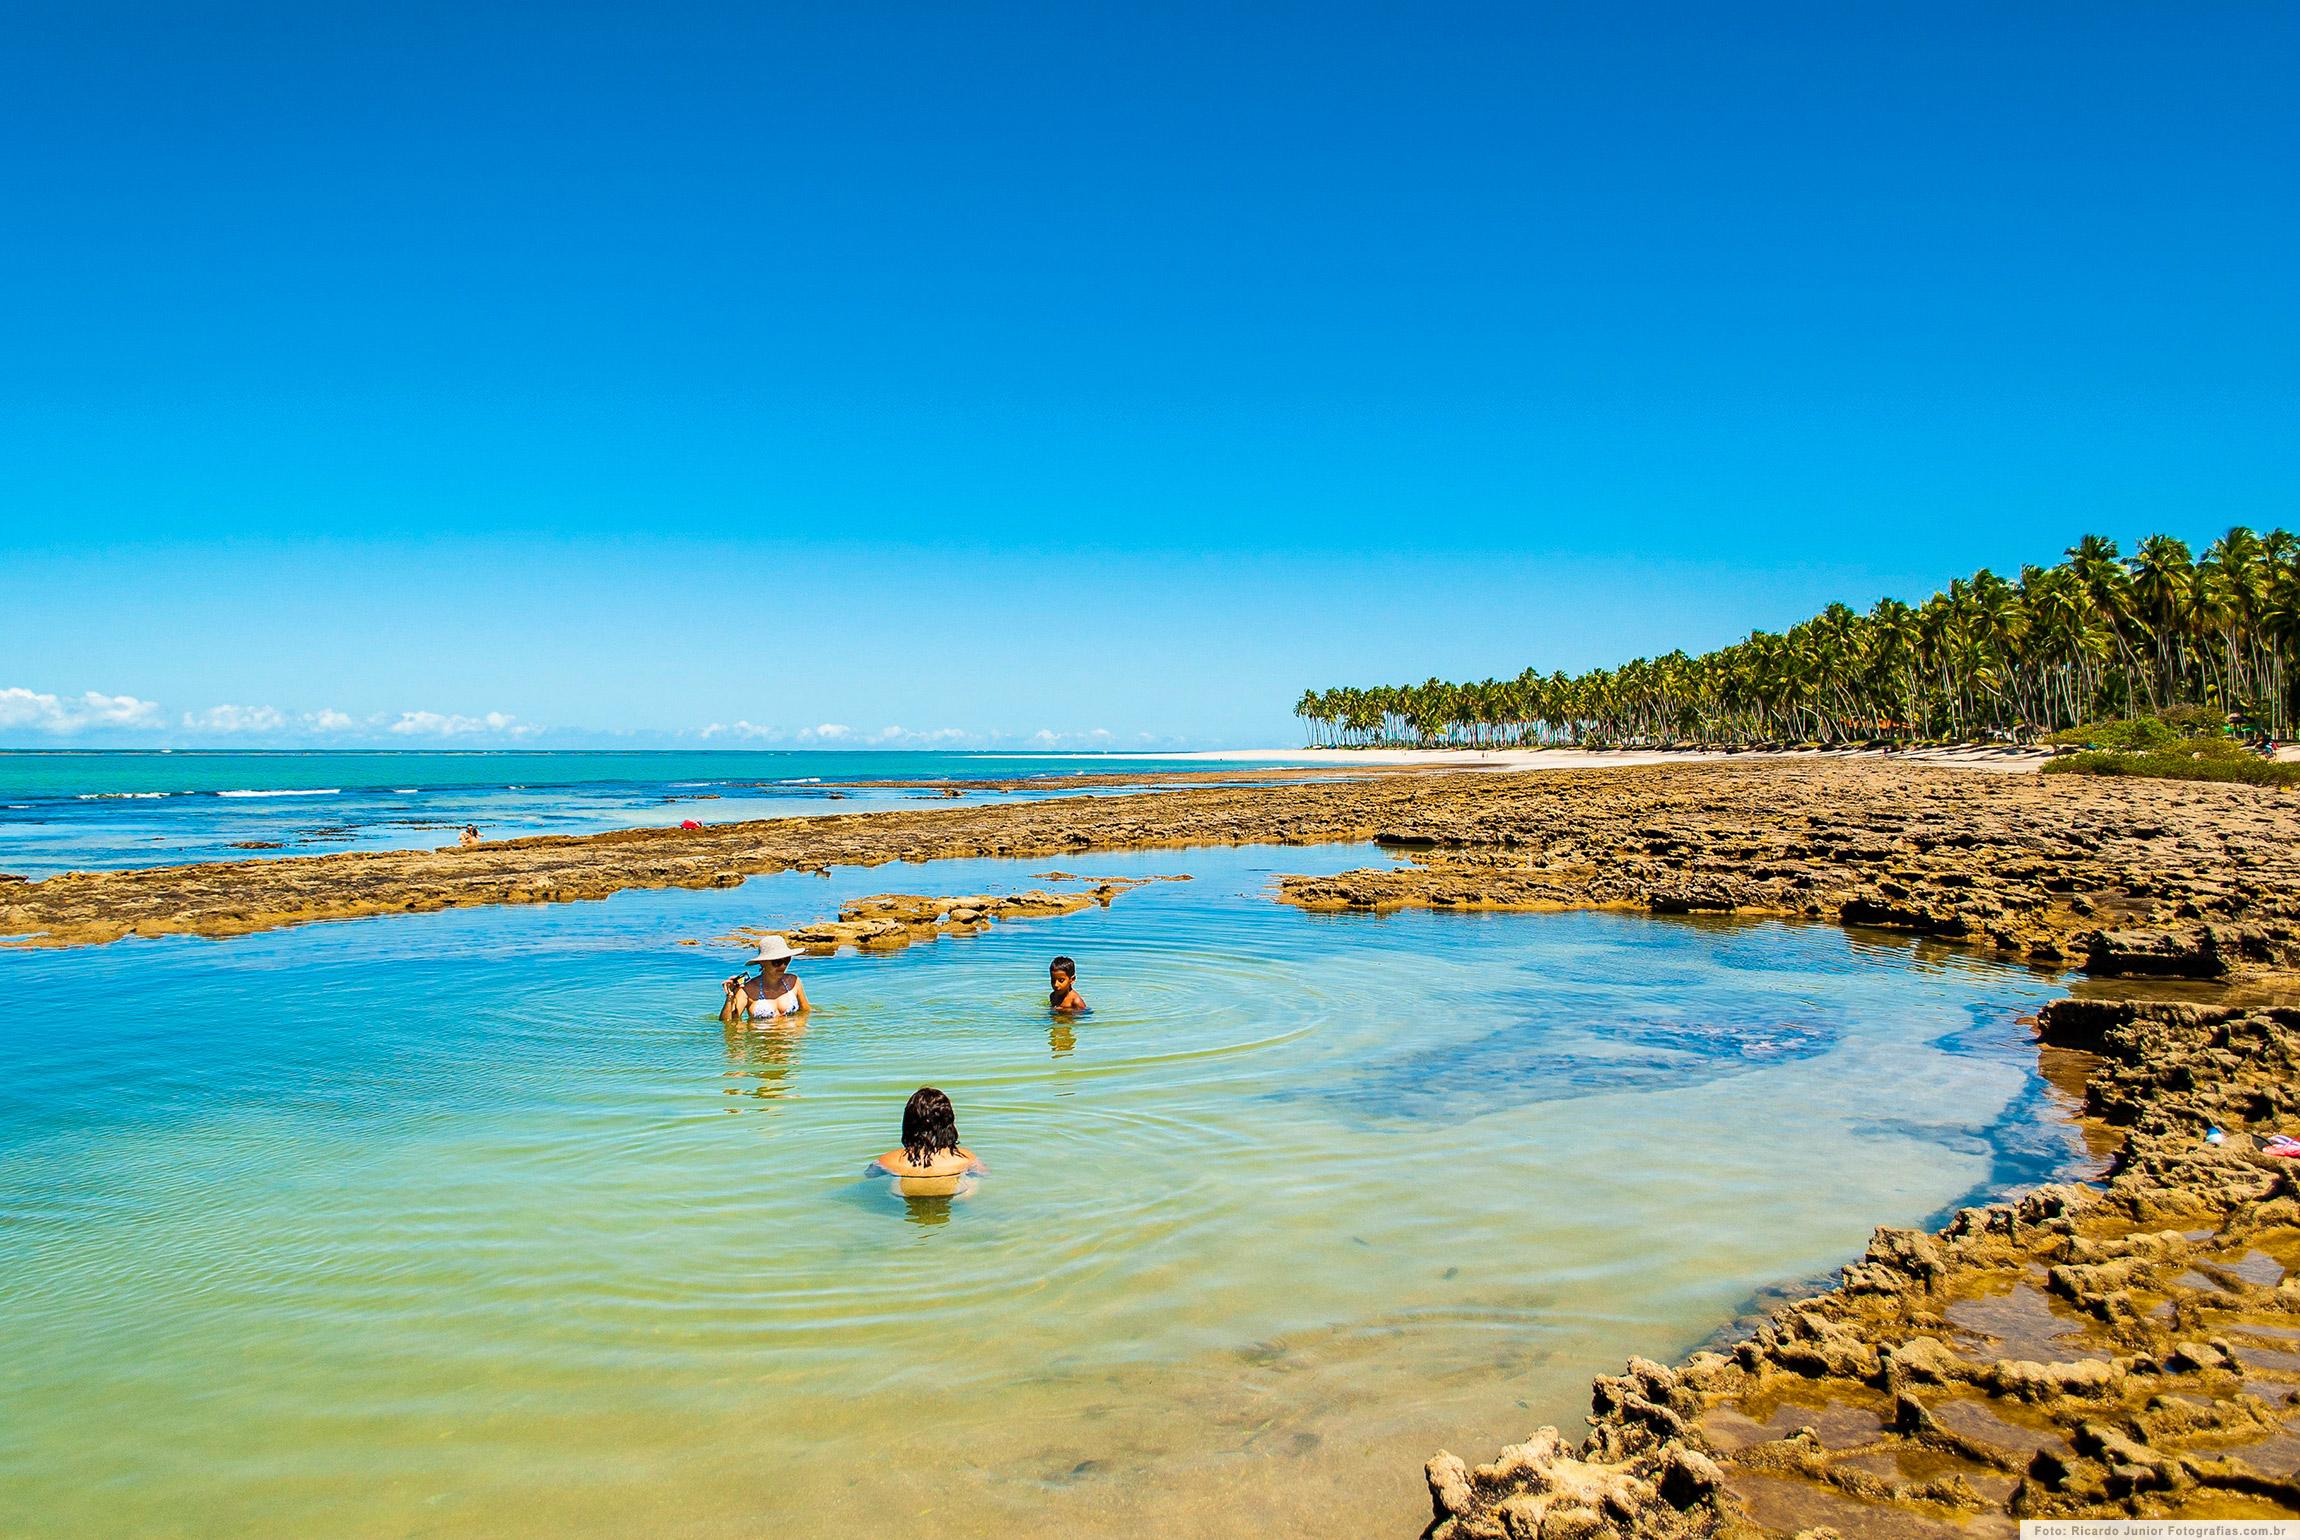 Piscinas Naturais da Praia dos Carneiros - Pernambuco